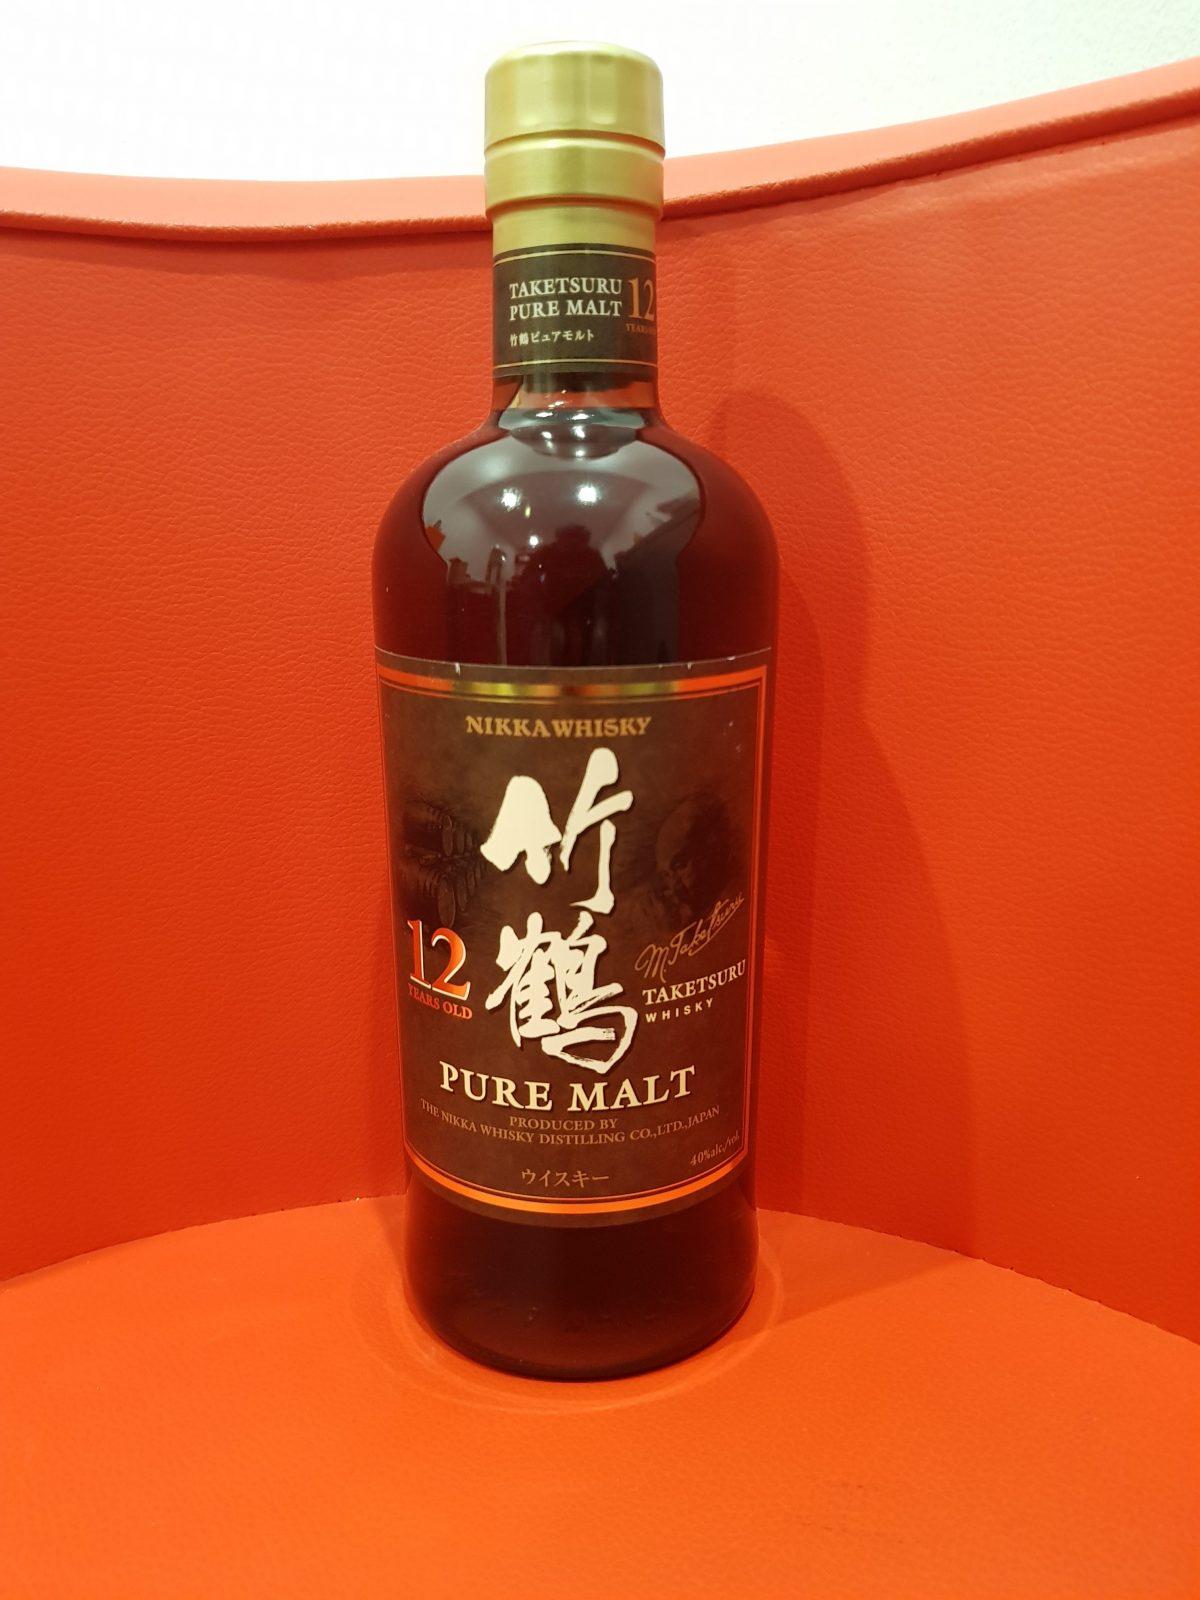 Nikka Taketsuru Pure Malt Japanese Whisky 12 YO 700ml 40 % abv